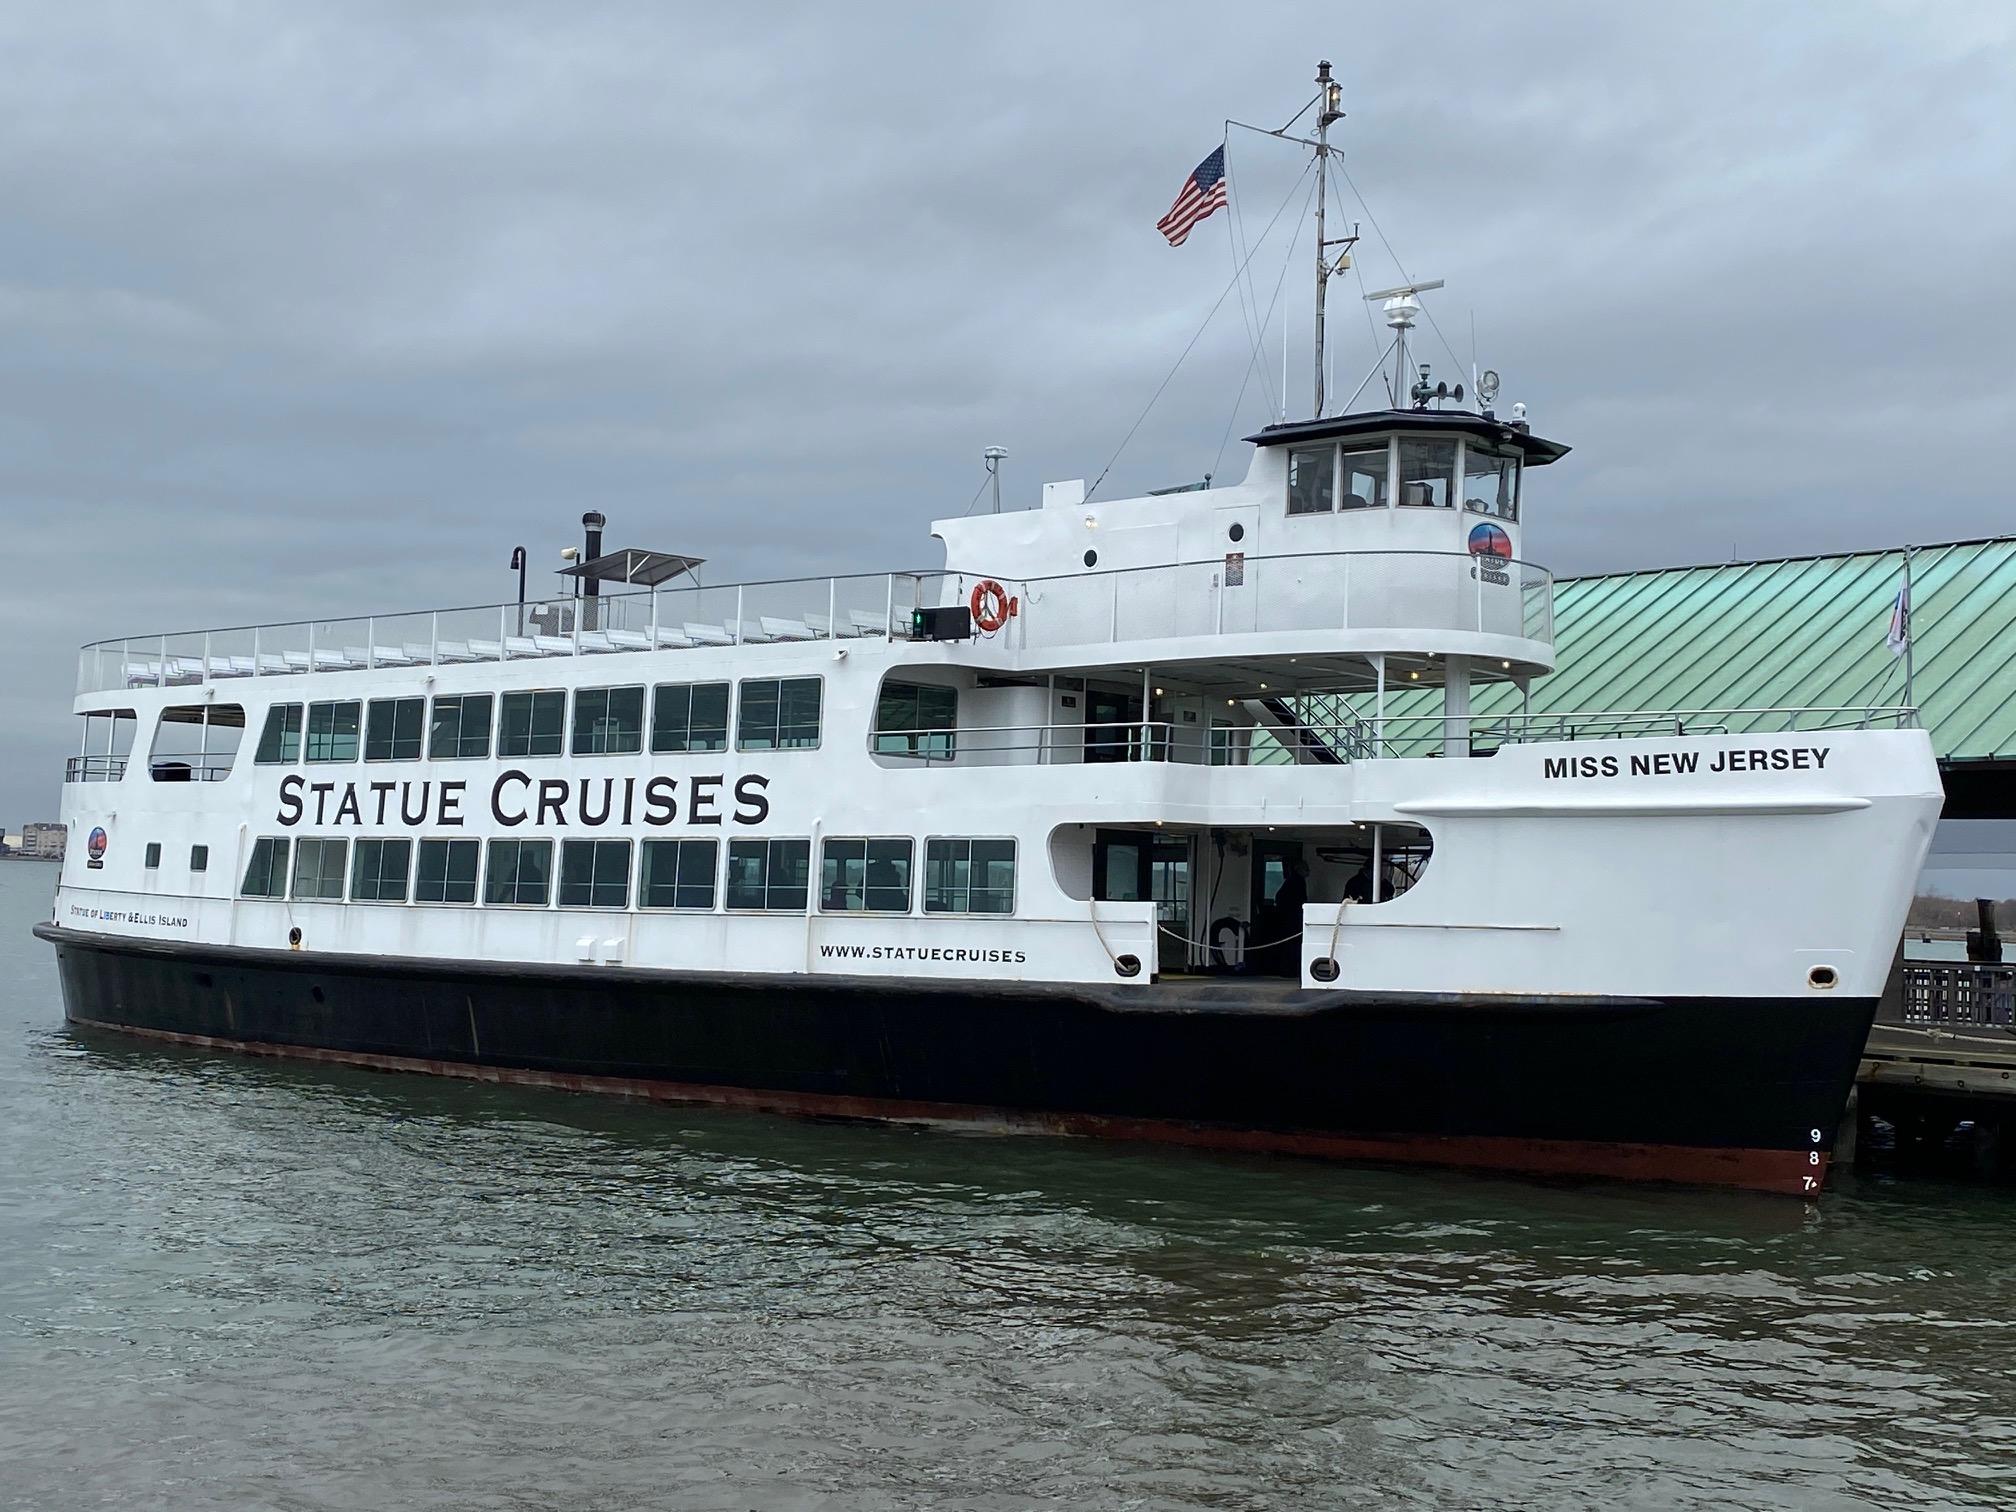 Statue of Liberty Statue Cruises